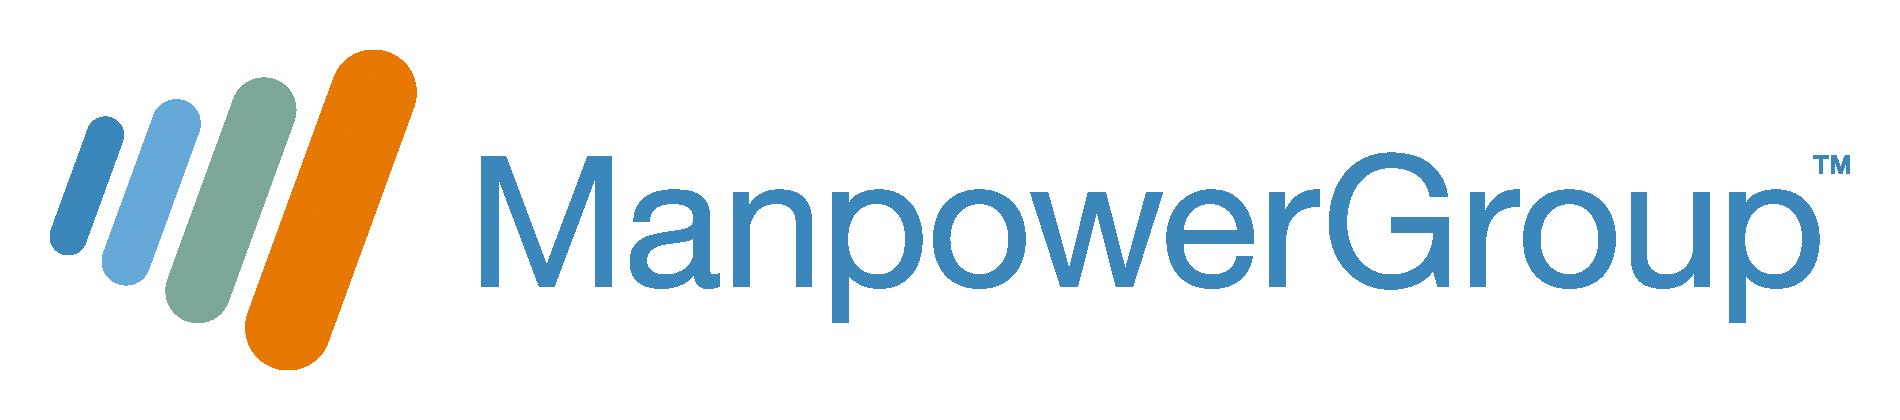 ManpowerGroup_horizontal